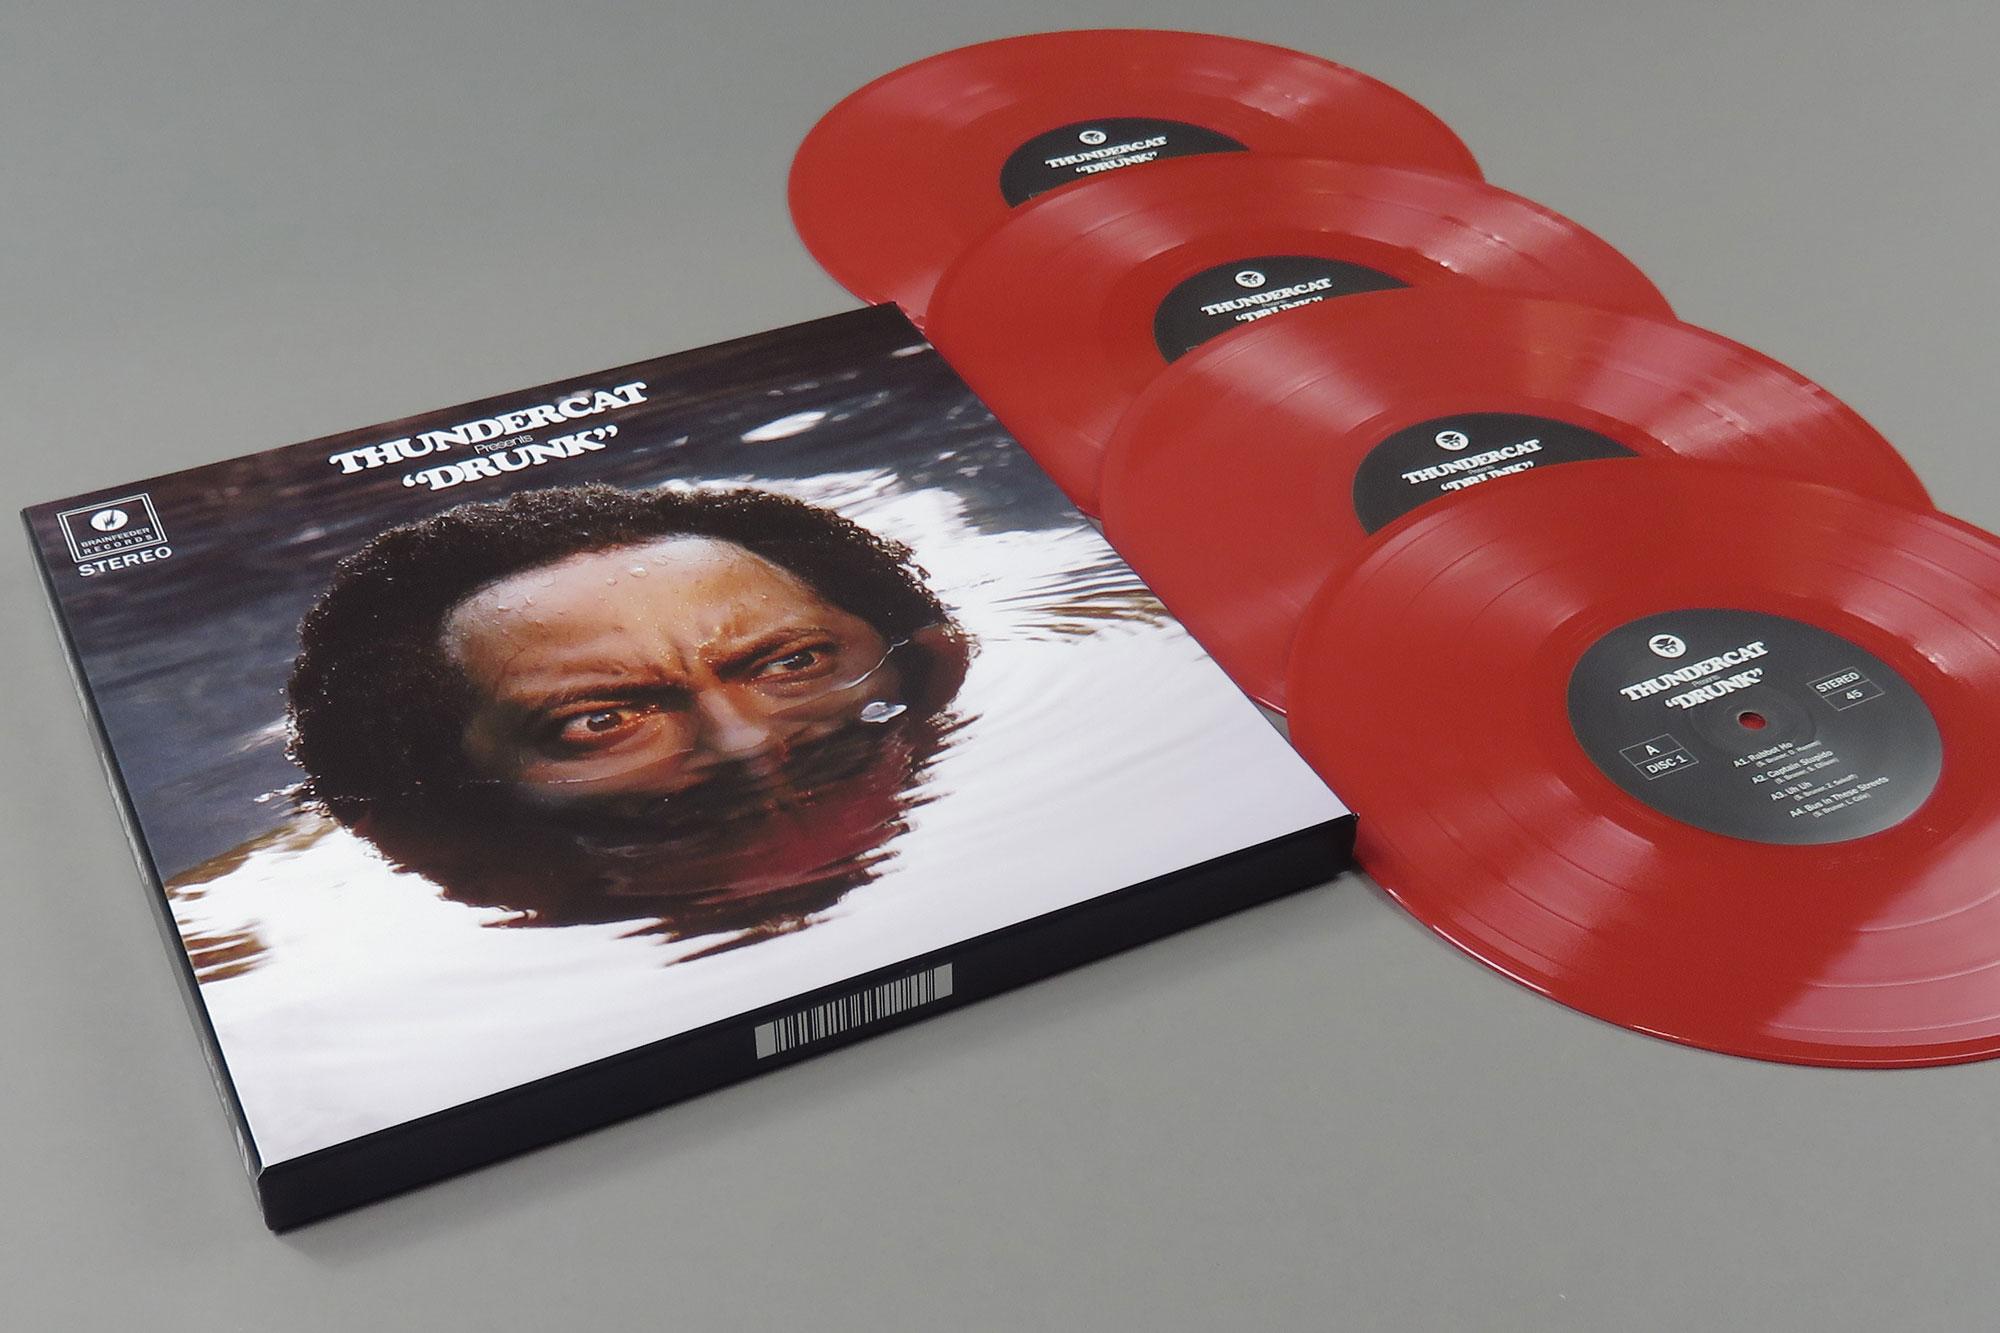 Deluxe vinyl box set. Image: Bleep